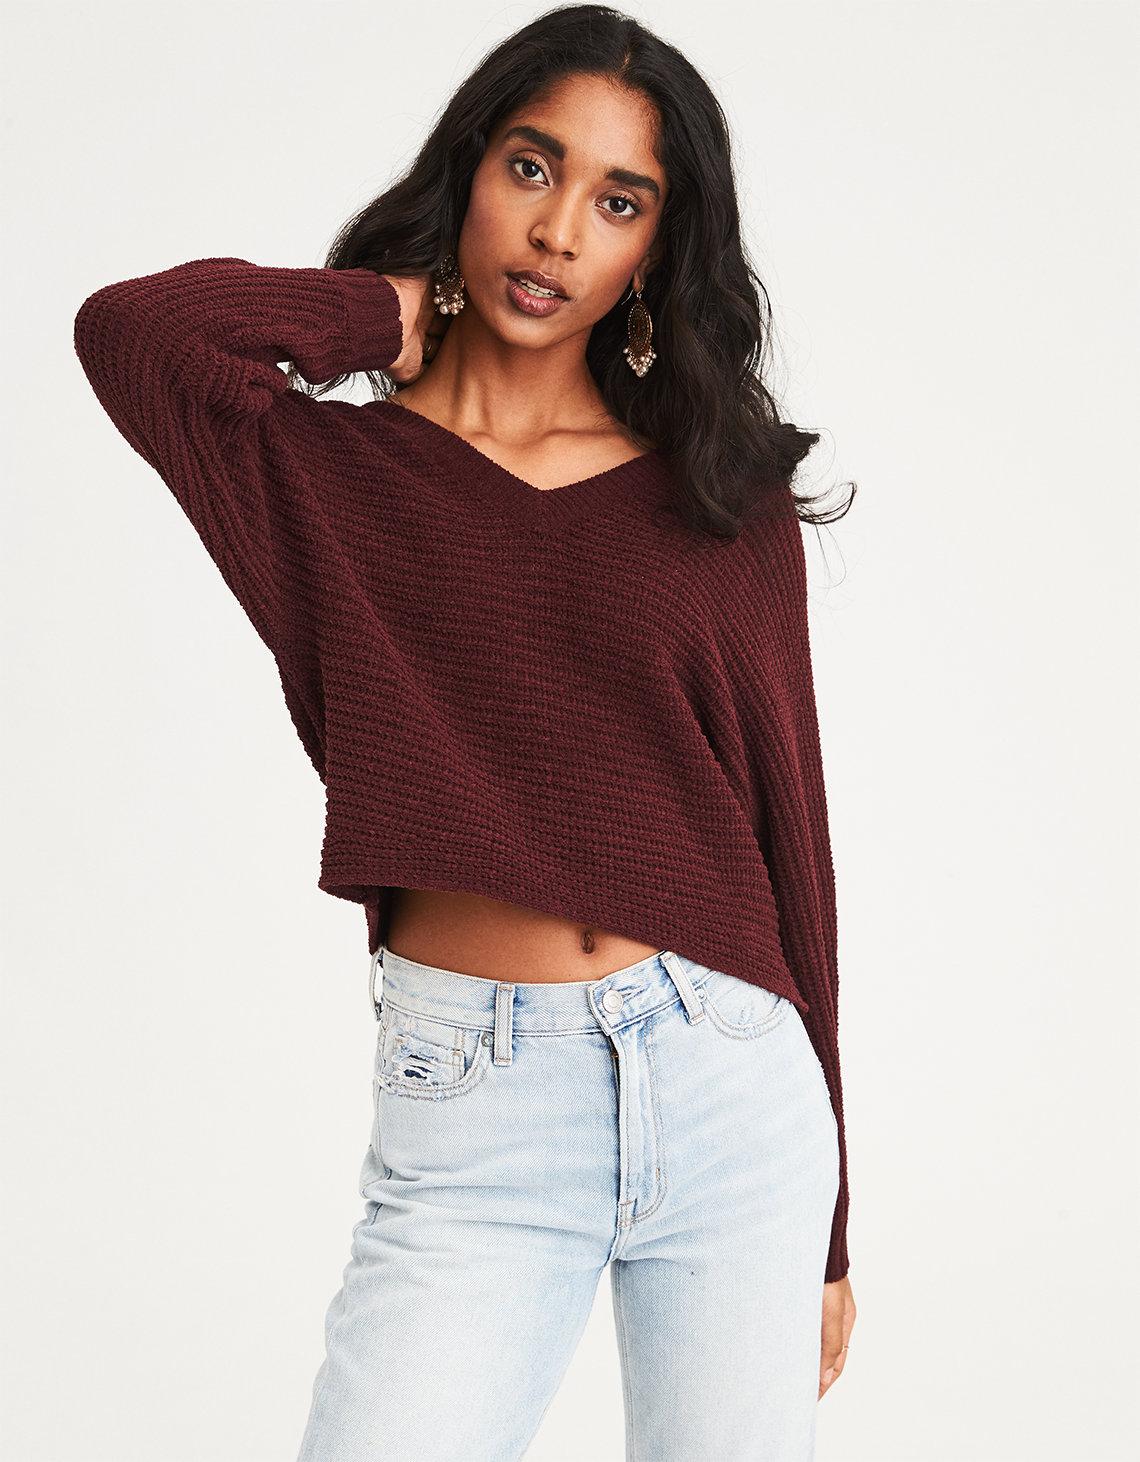 9e58545efb65fe AE Chenille V-Neck Cropped Sweater. Placeholder image. Product Image